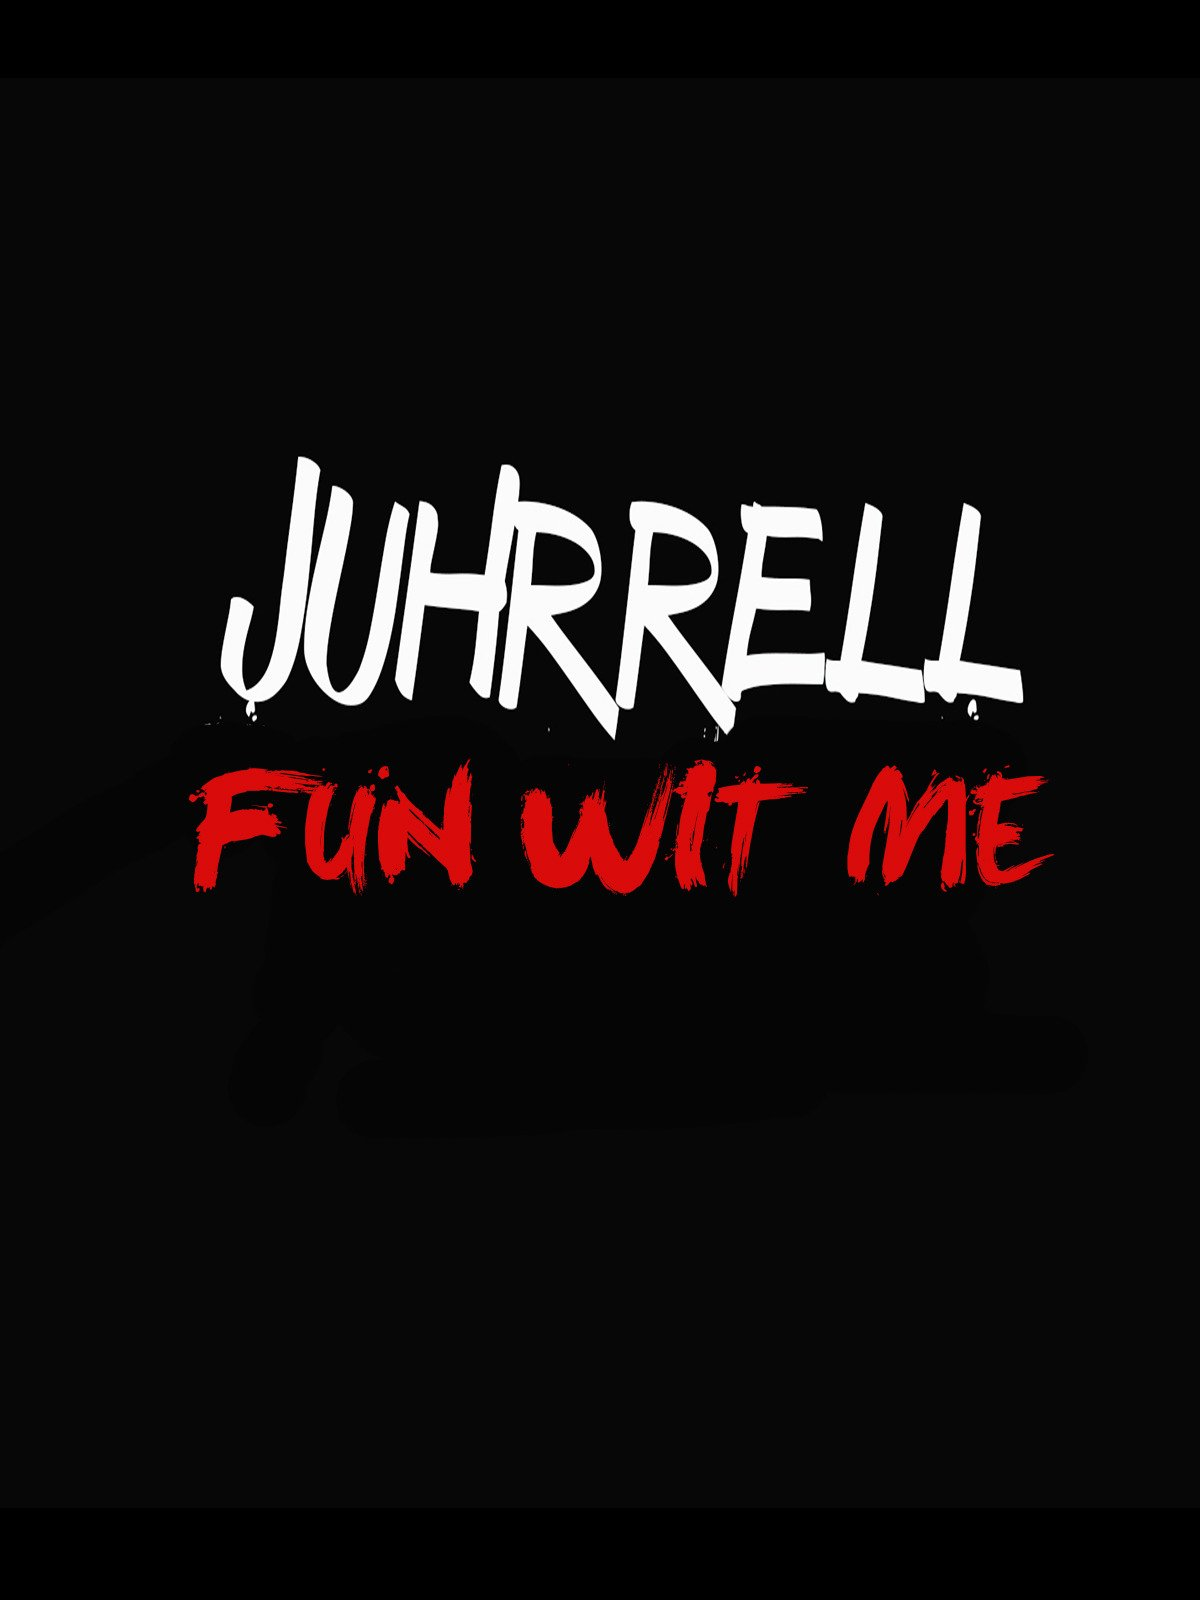 Juhrrell